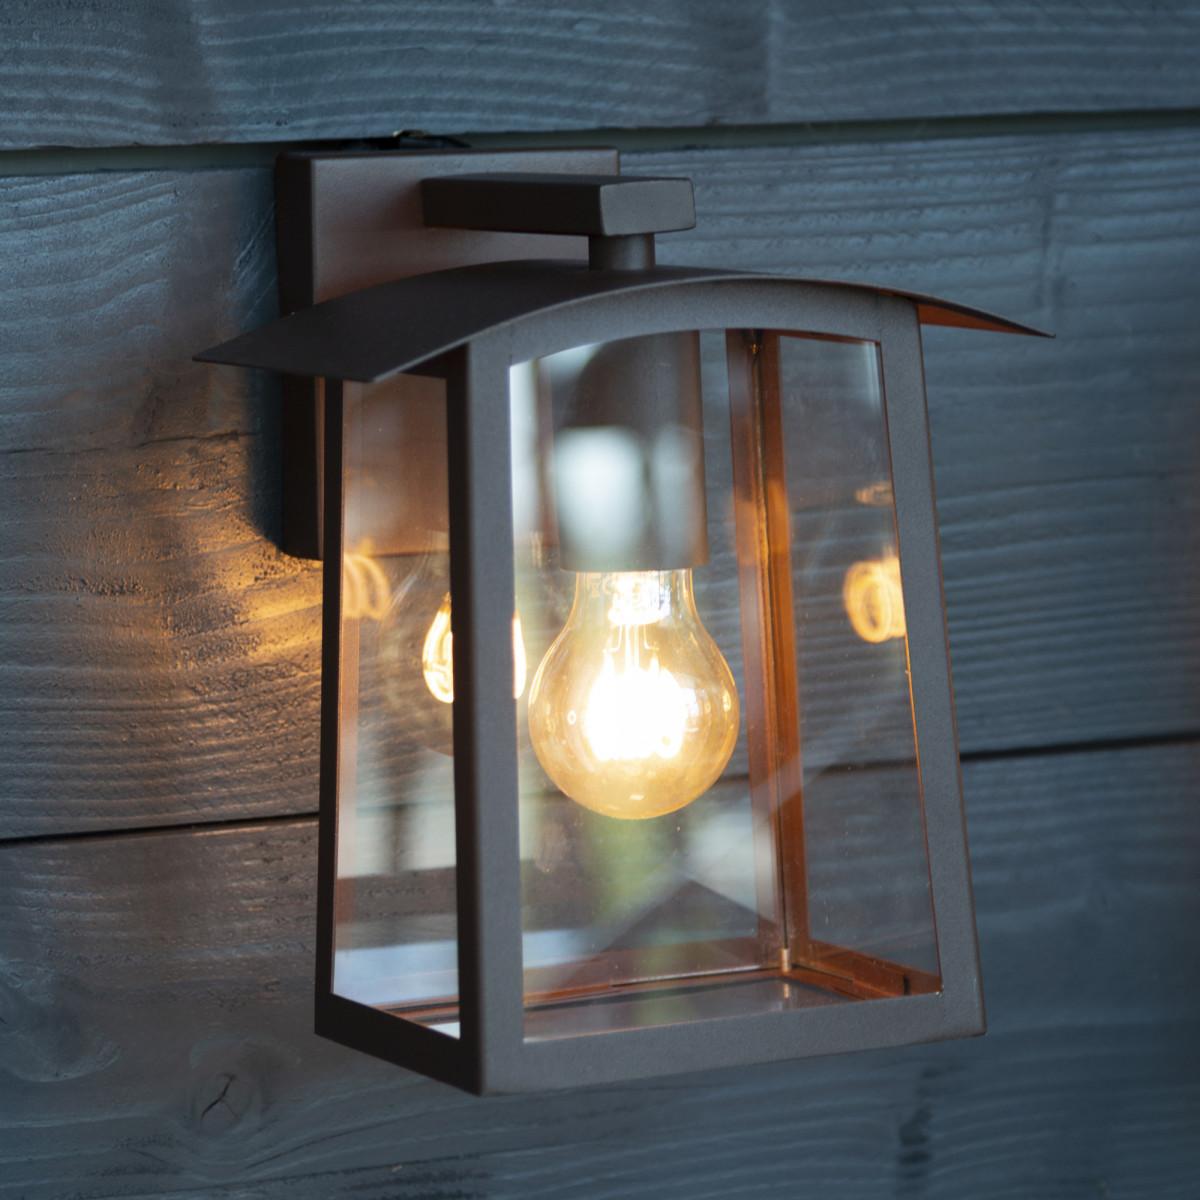 Design buitenlamp muur 7594